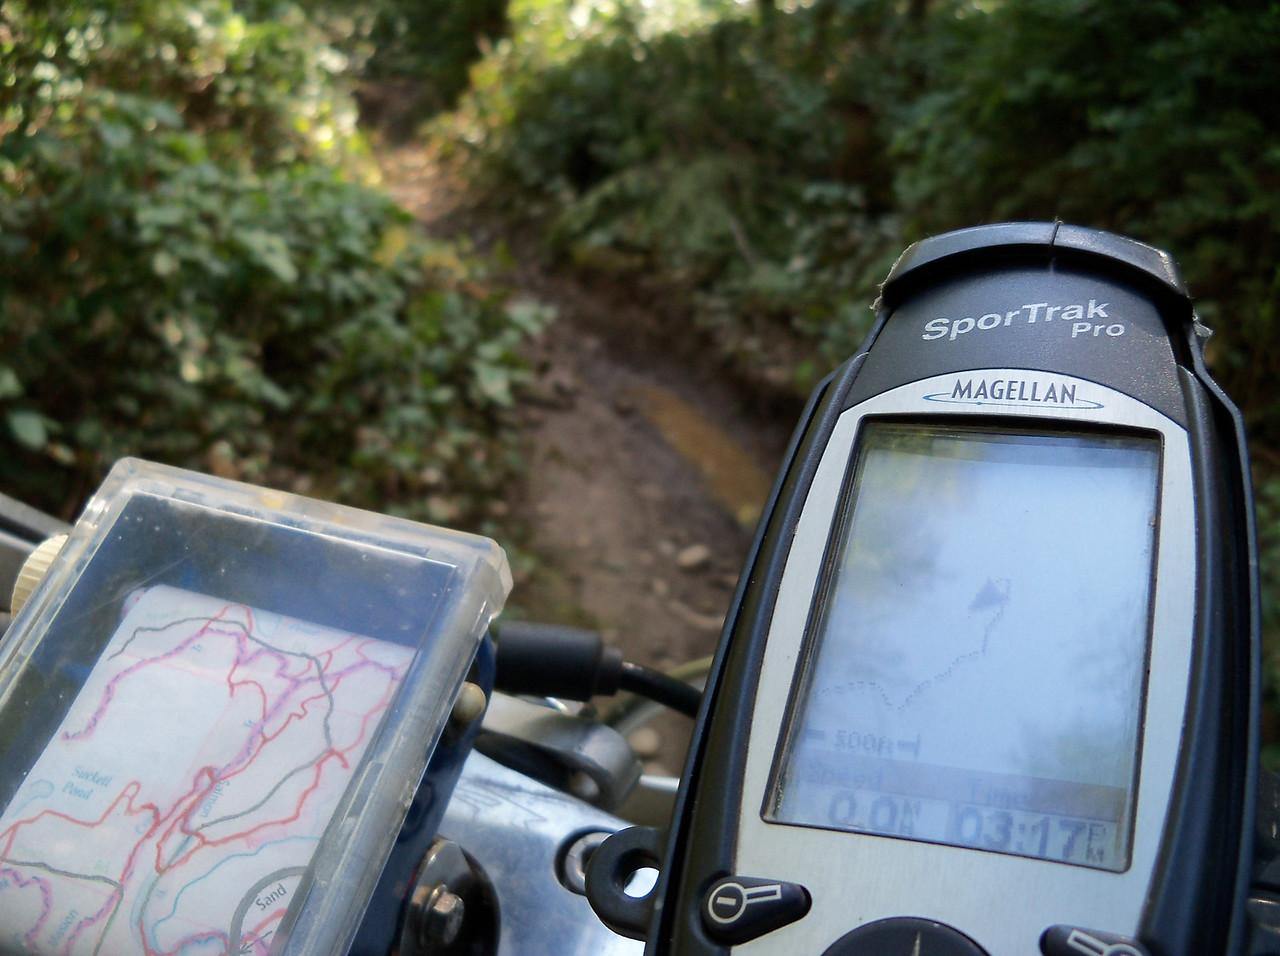 Friday just Sylvia & I went trail riding..